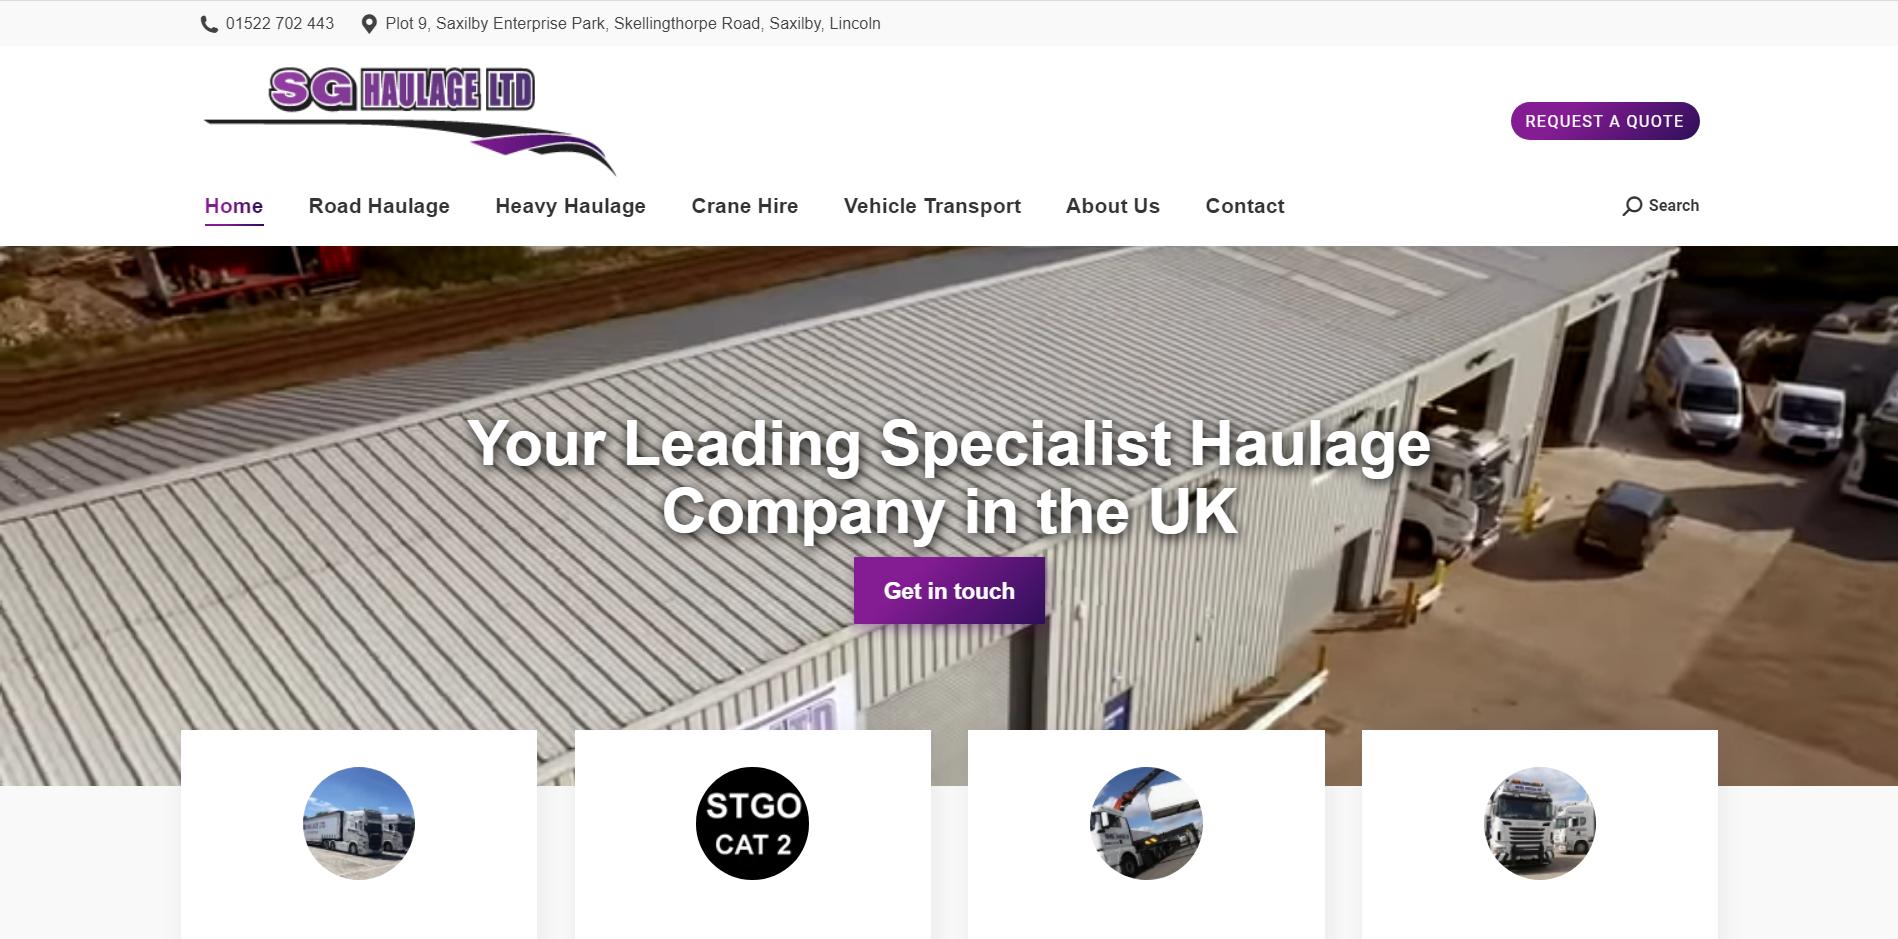 SG Haulage Ltd